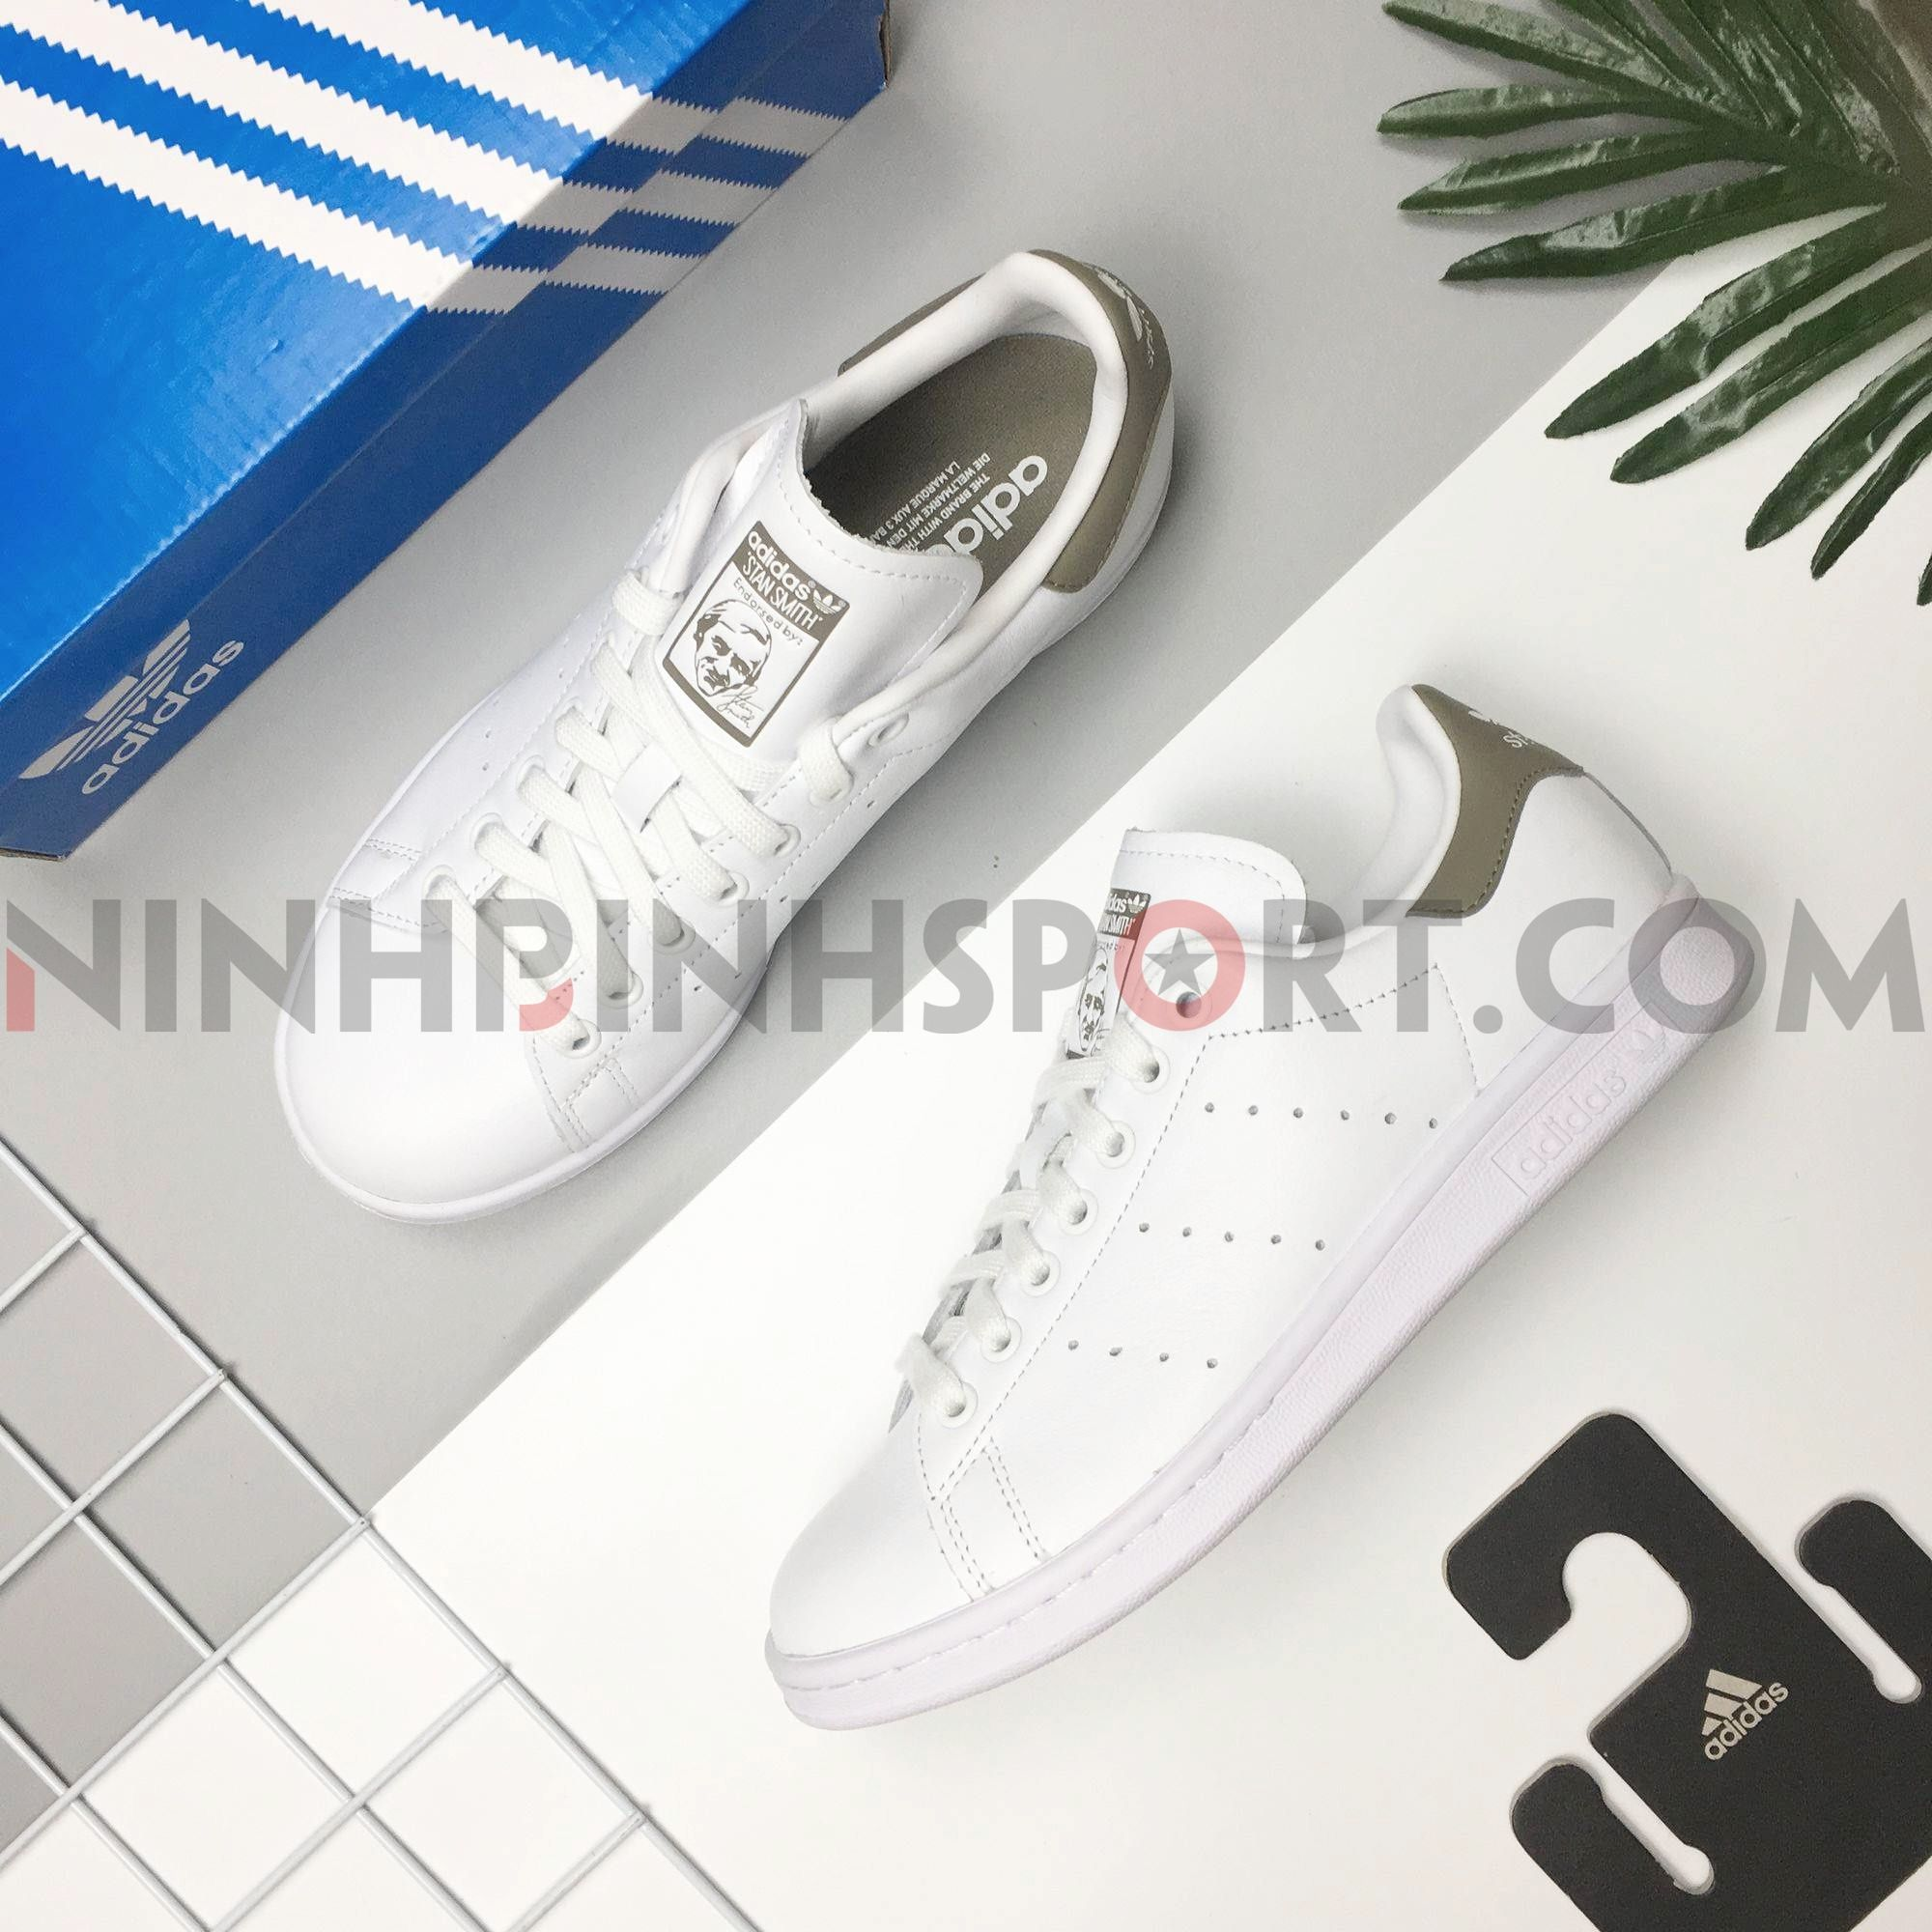 Giầy thể thao nam Adidas Originals Stan Smith EE5798